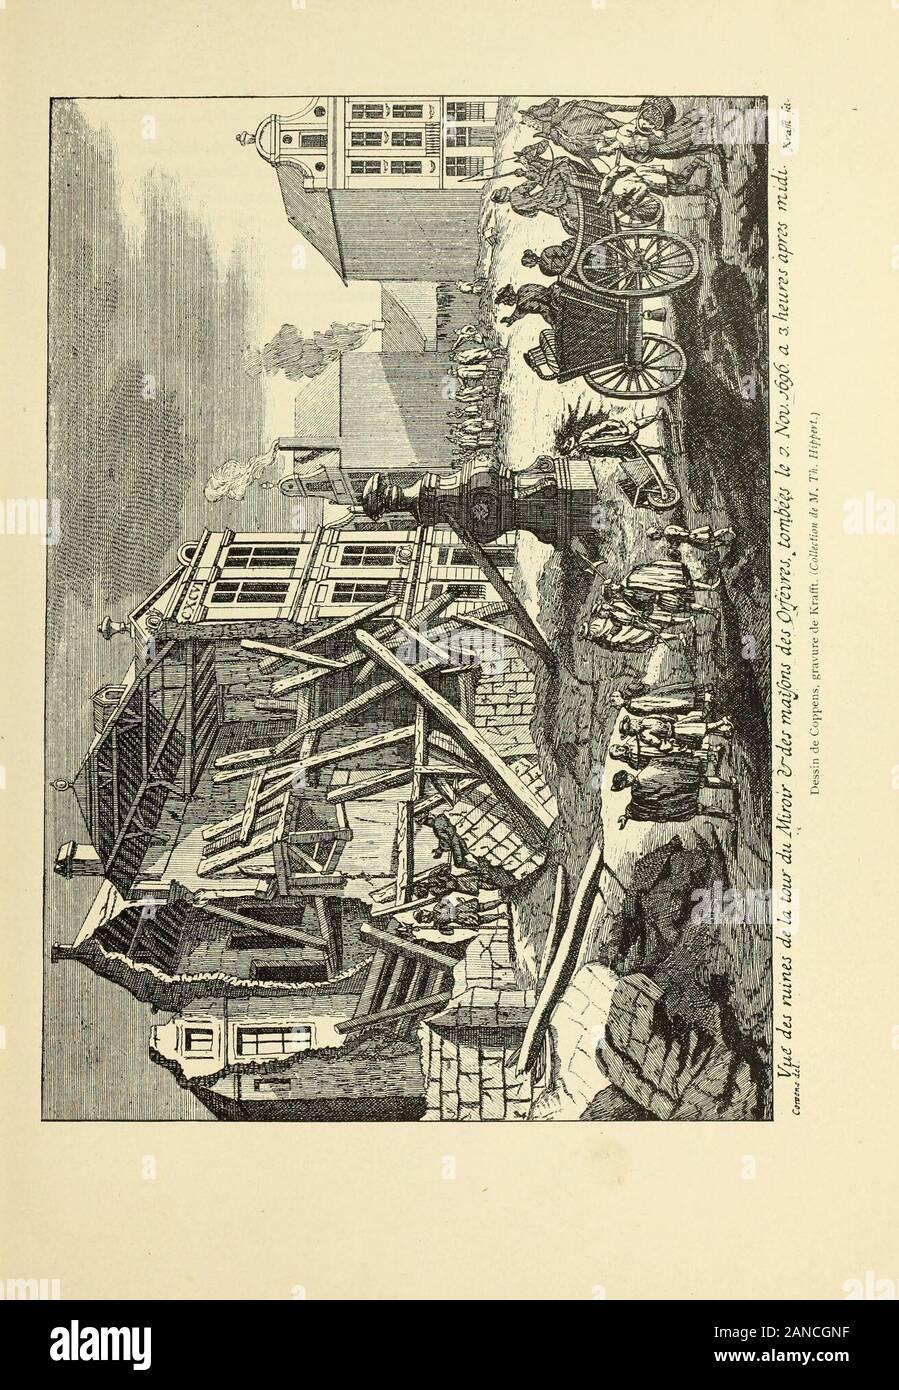 Maison En Ruine Dessin 1790' stock photos & 1790' stock images - page 32 - alamy